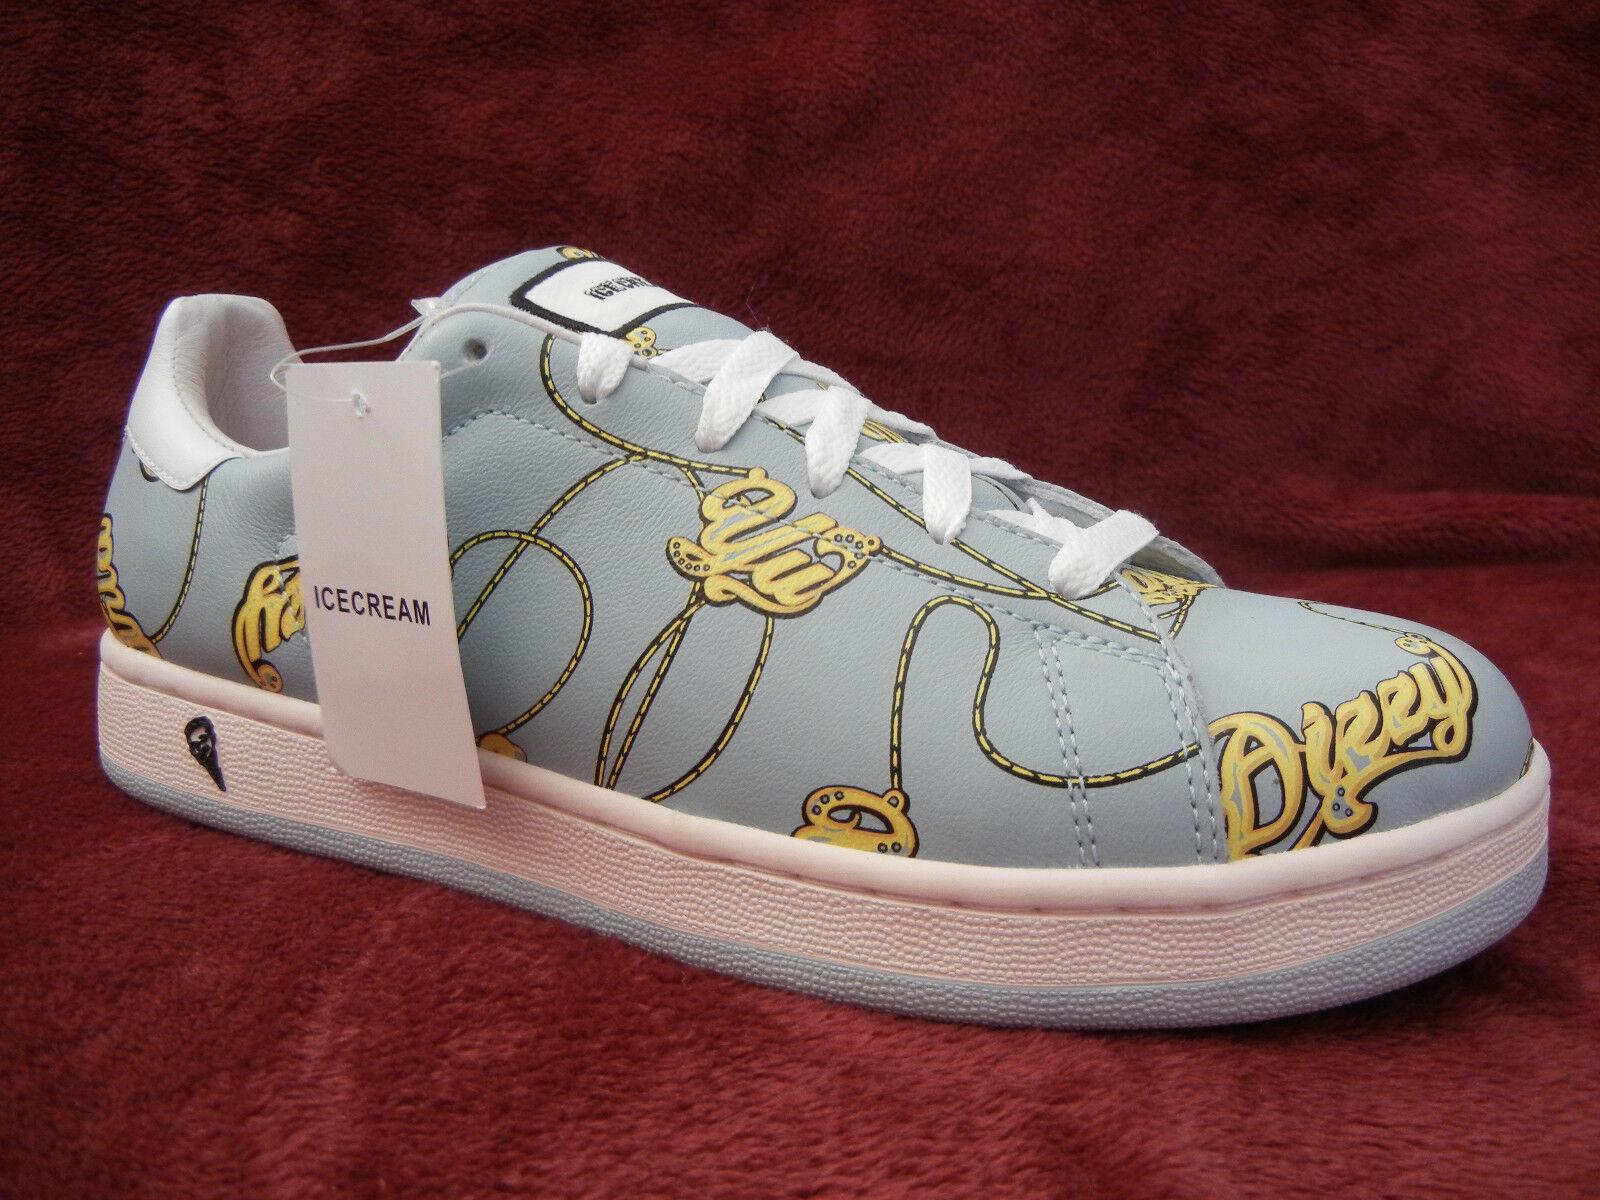 Reebok Ice Cream  BENDI  Boutiques shoes  NameChain SIZE 8  Pharrell BBCICECREAM